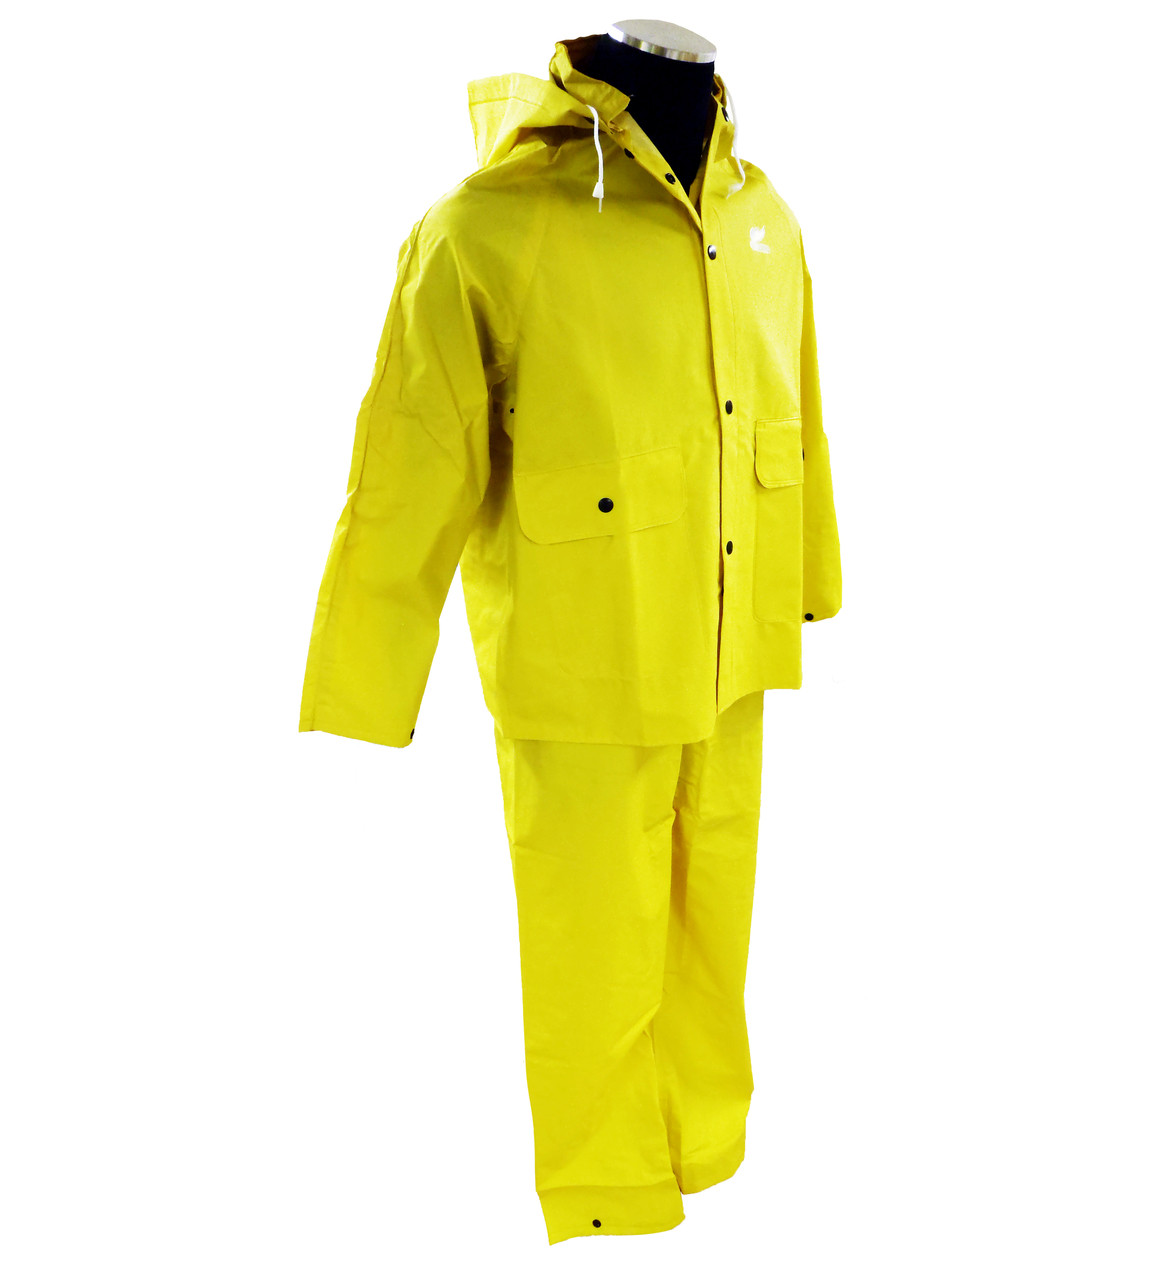 0da101fba Onguard® Sitex 3 Piece PVC Rainsuits   High Visibility Rainwear   Hi ...